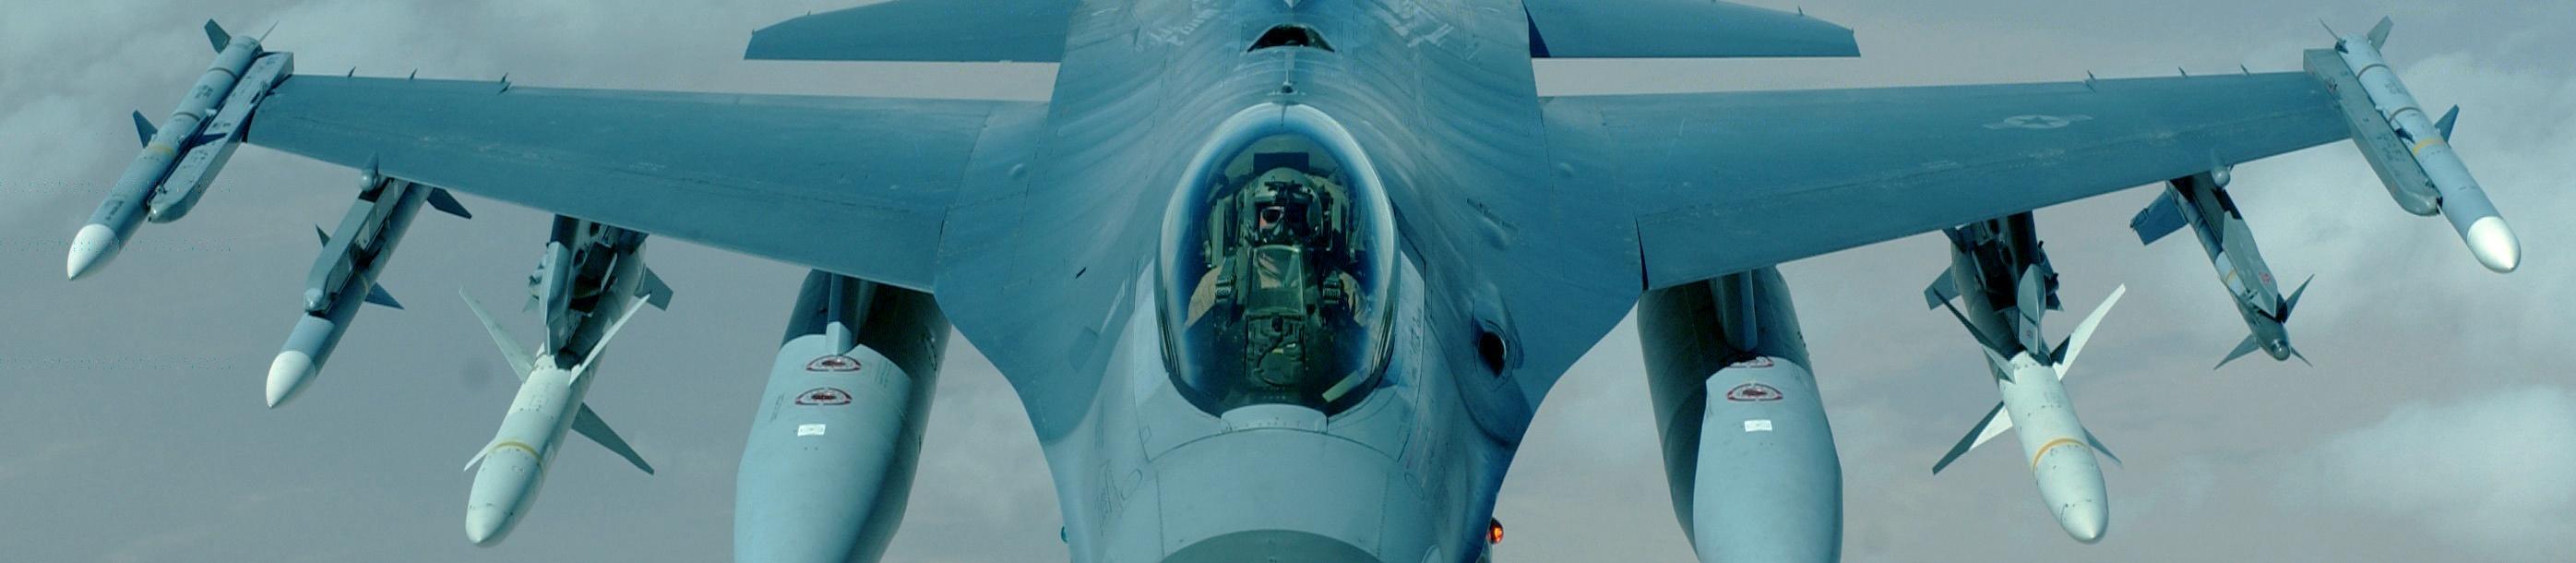 fighter-jet.jpg